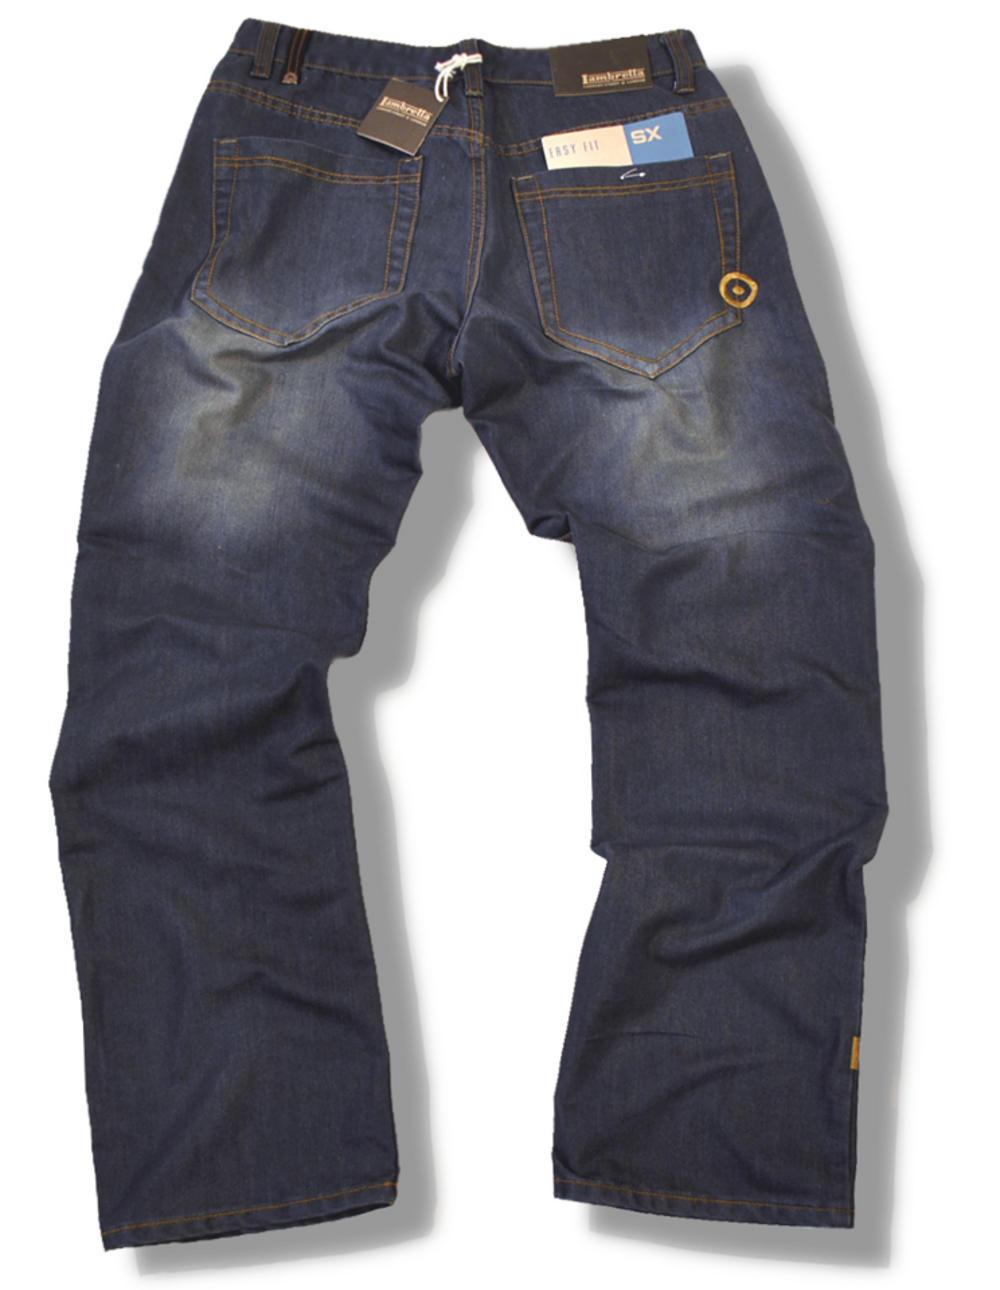 5eb5ac07440 Lambretta Clean Mod Target Dark Denim Easy Fit Jeans | Adaptor Clothing